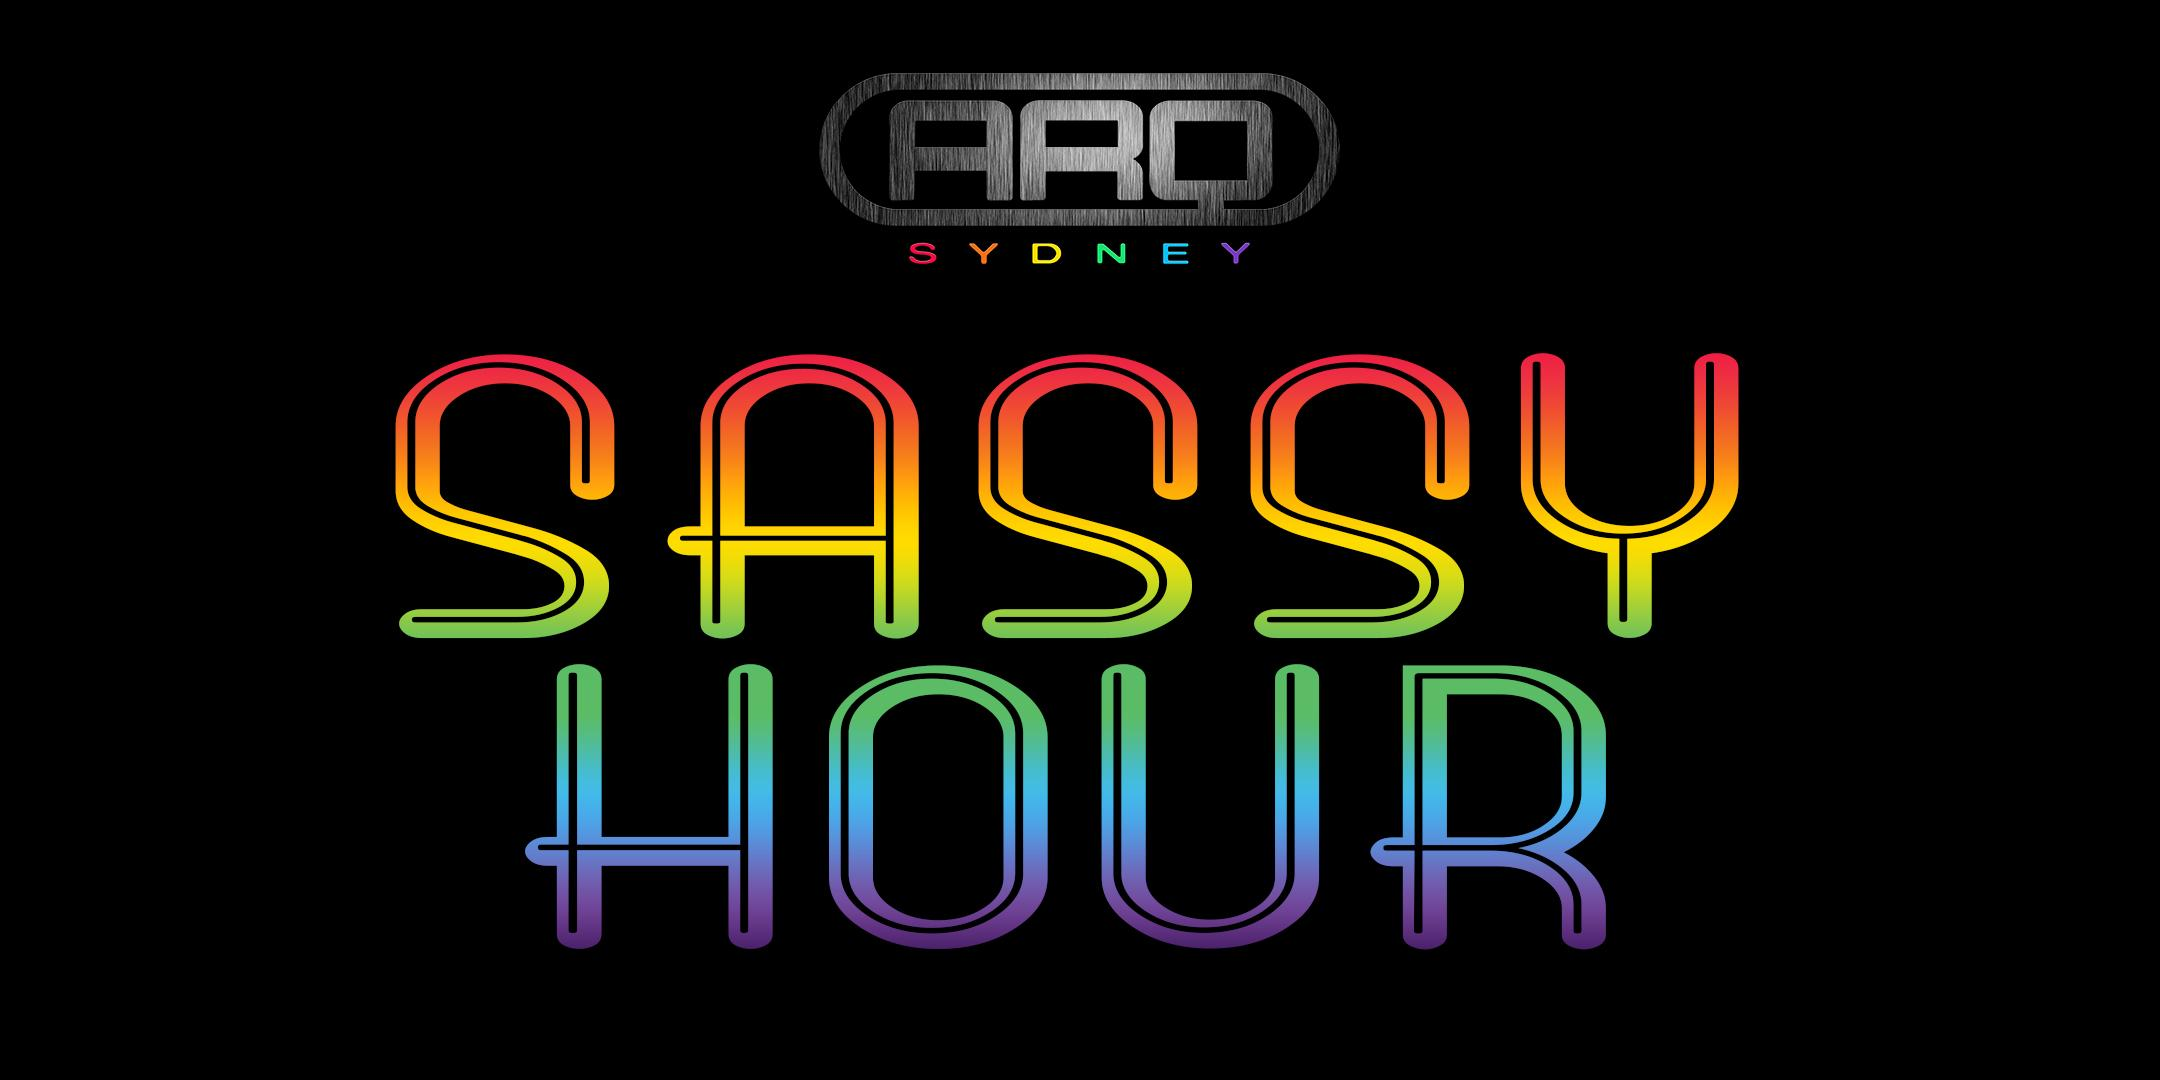 ARQ Sydney - Sat 22nd Feb, 2020 at 10:30pm AEDT.